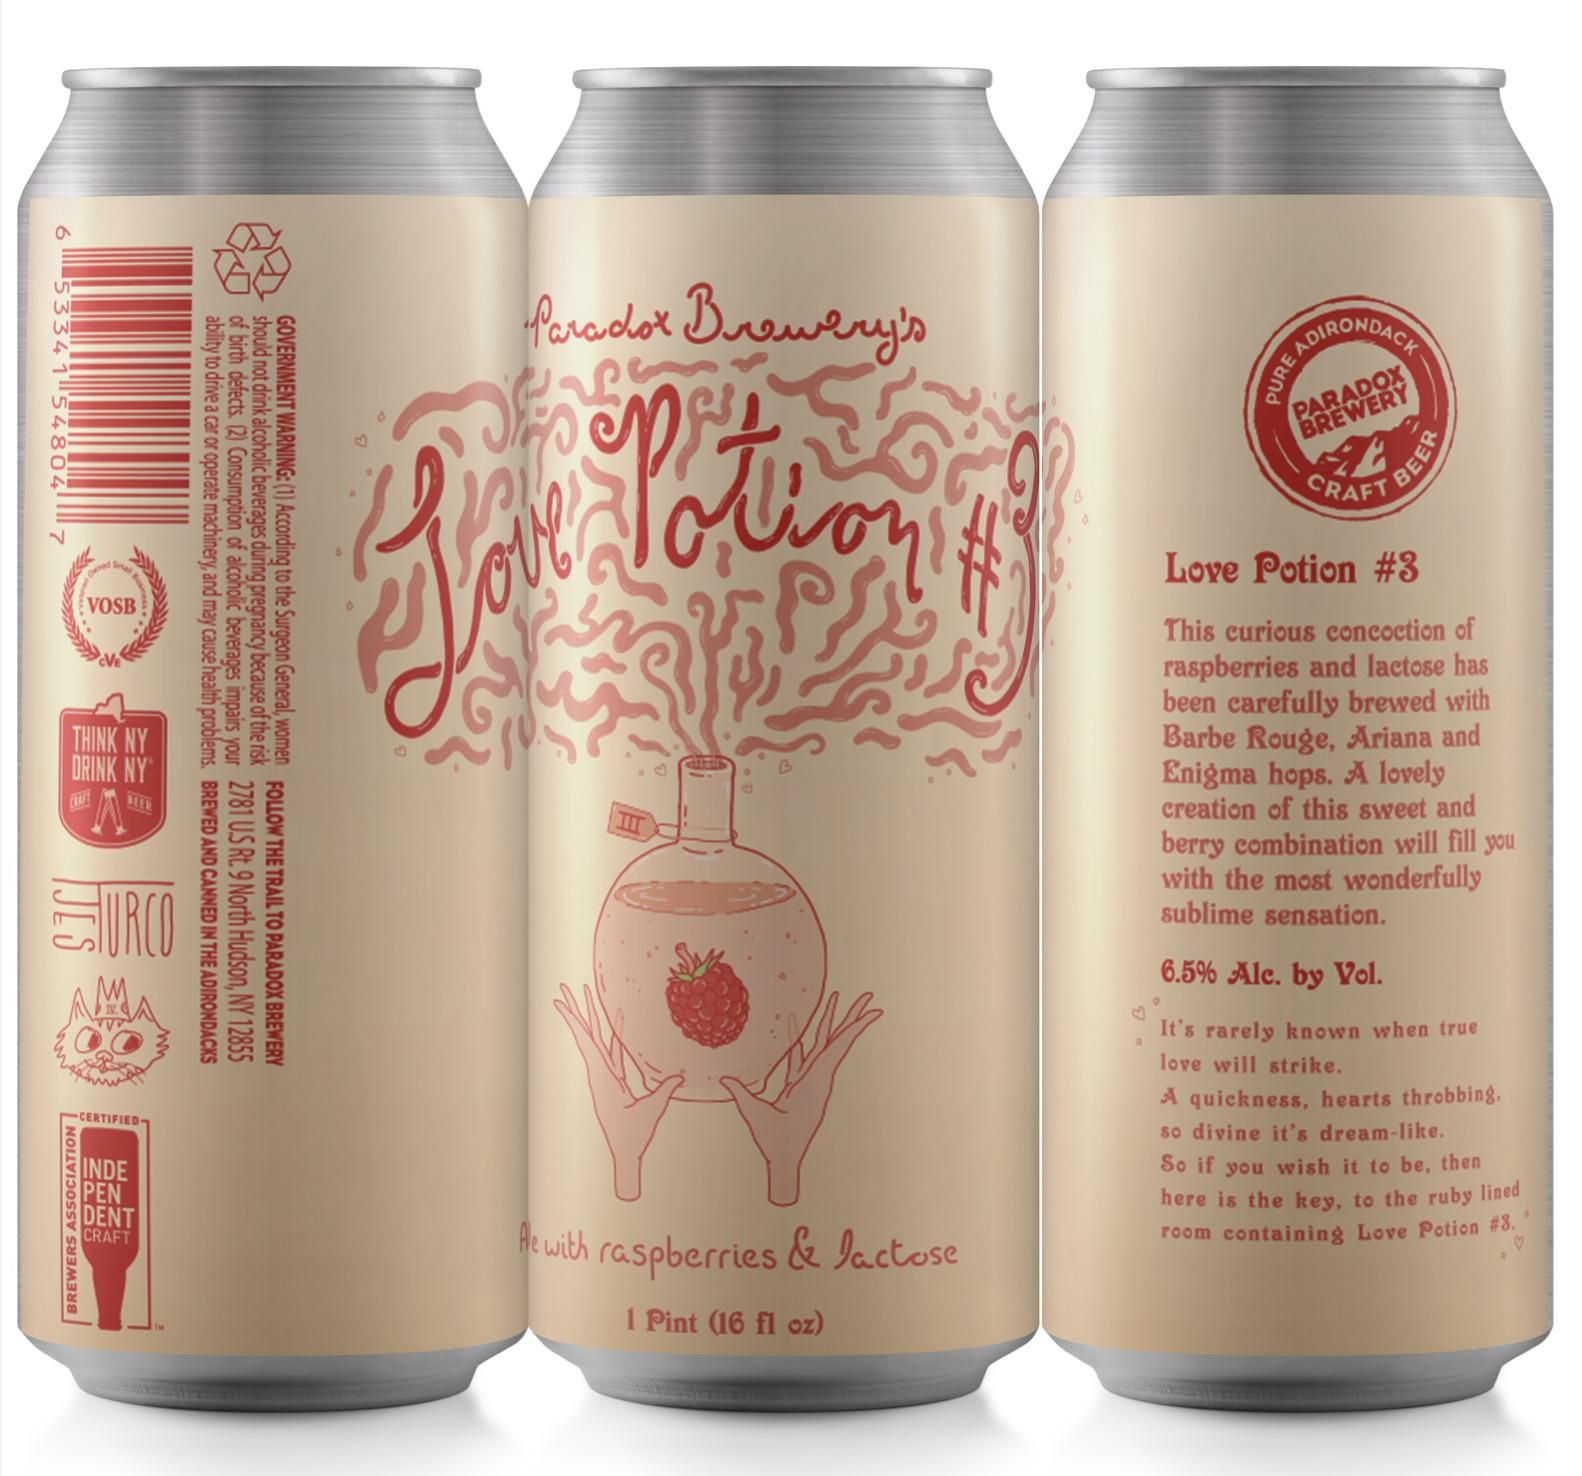 love potion 3 paradox brewery